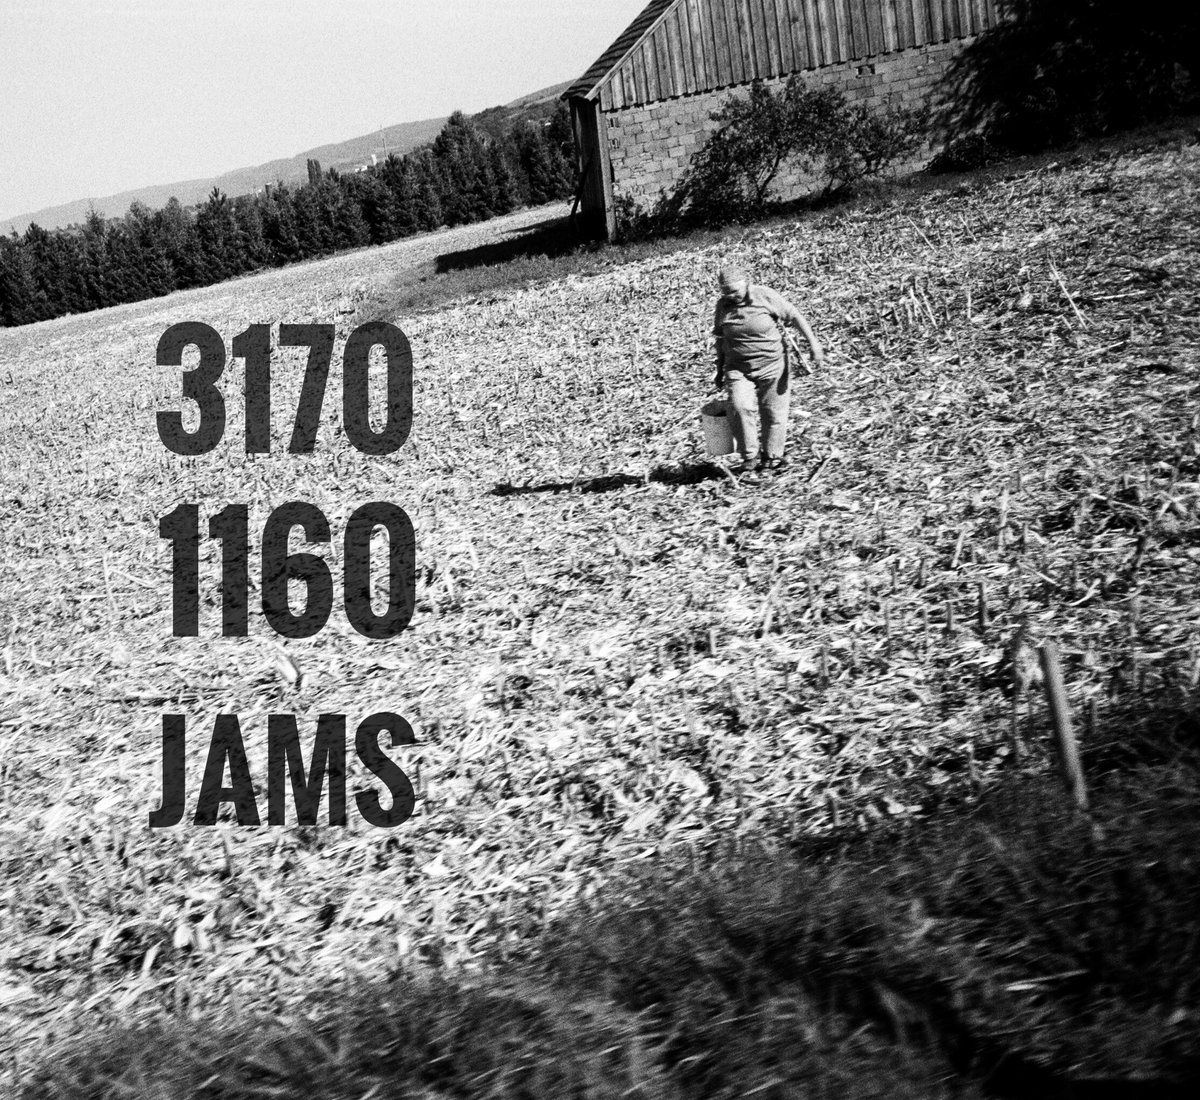 Hinterhof Records Kunstler 3170 1160 Jams